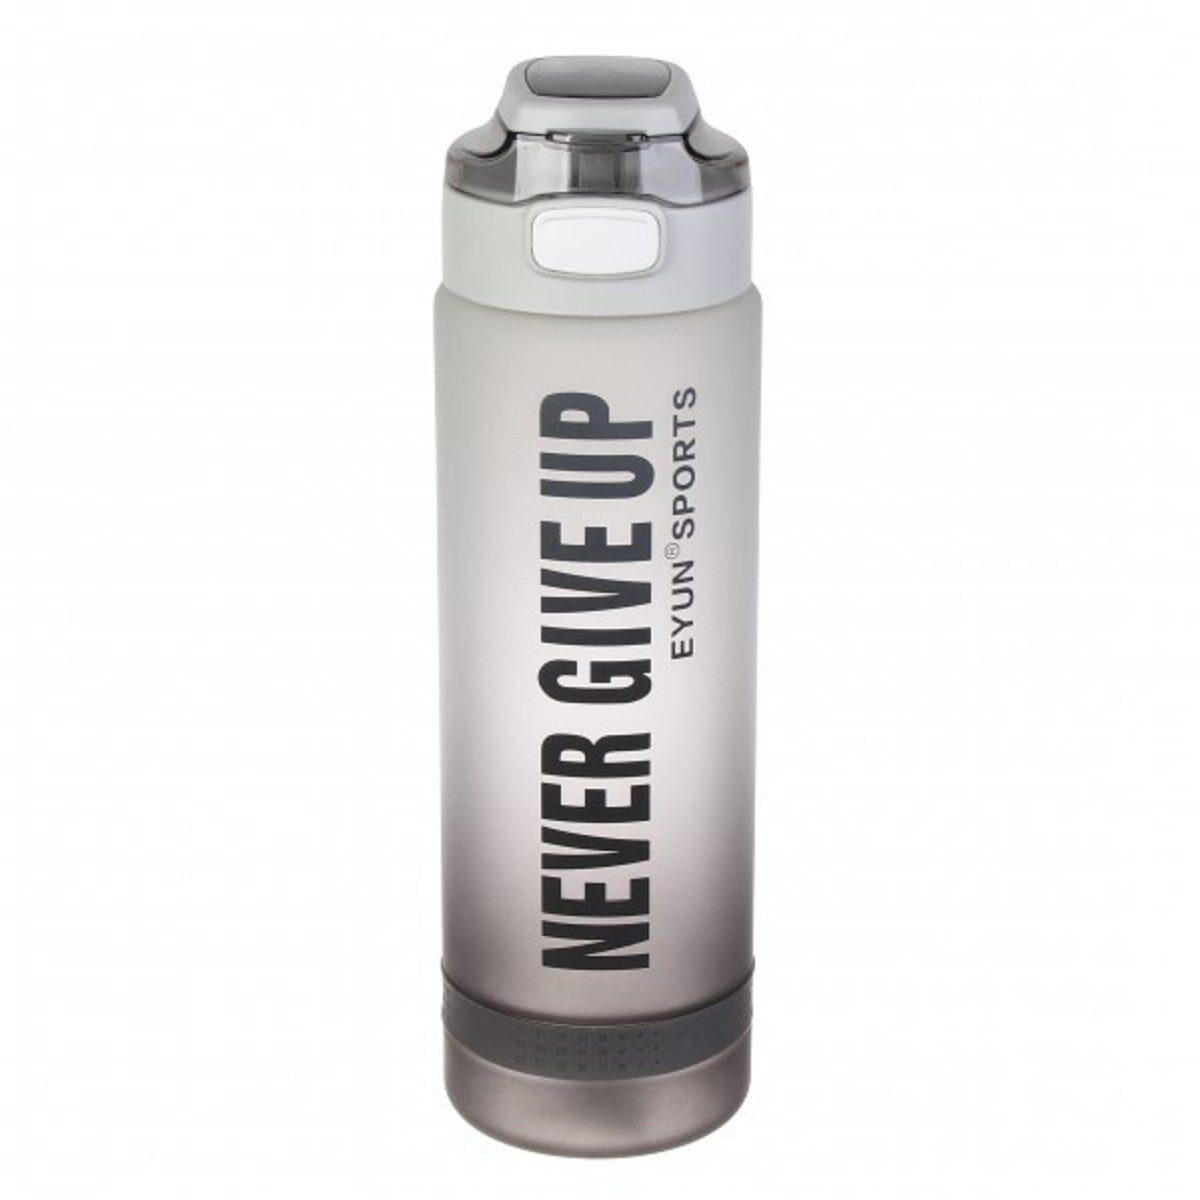 Пляшка для води Never Give Up 1 литр, градієнт сіро-чорна